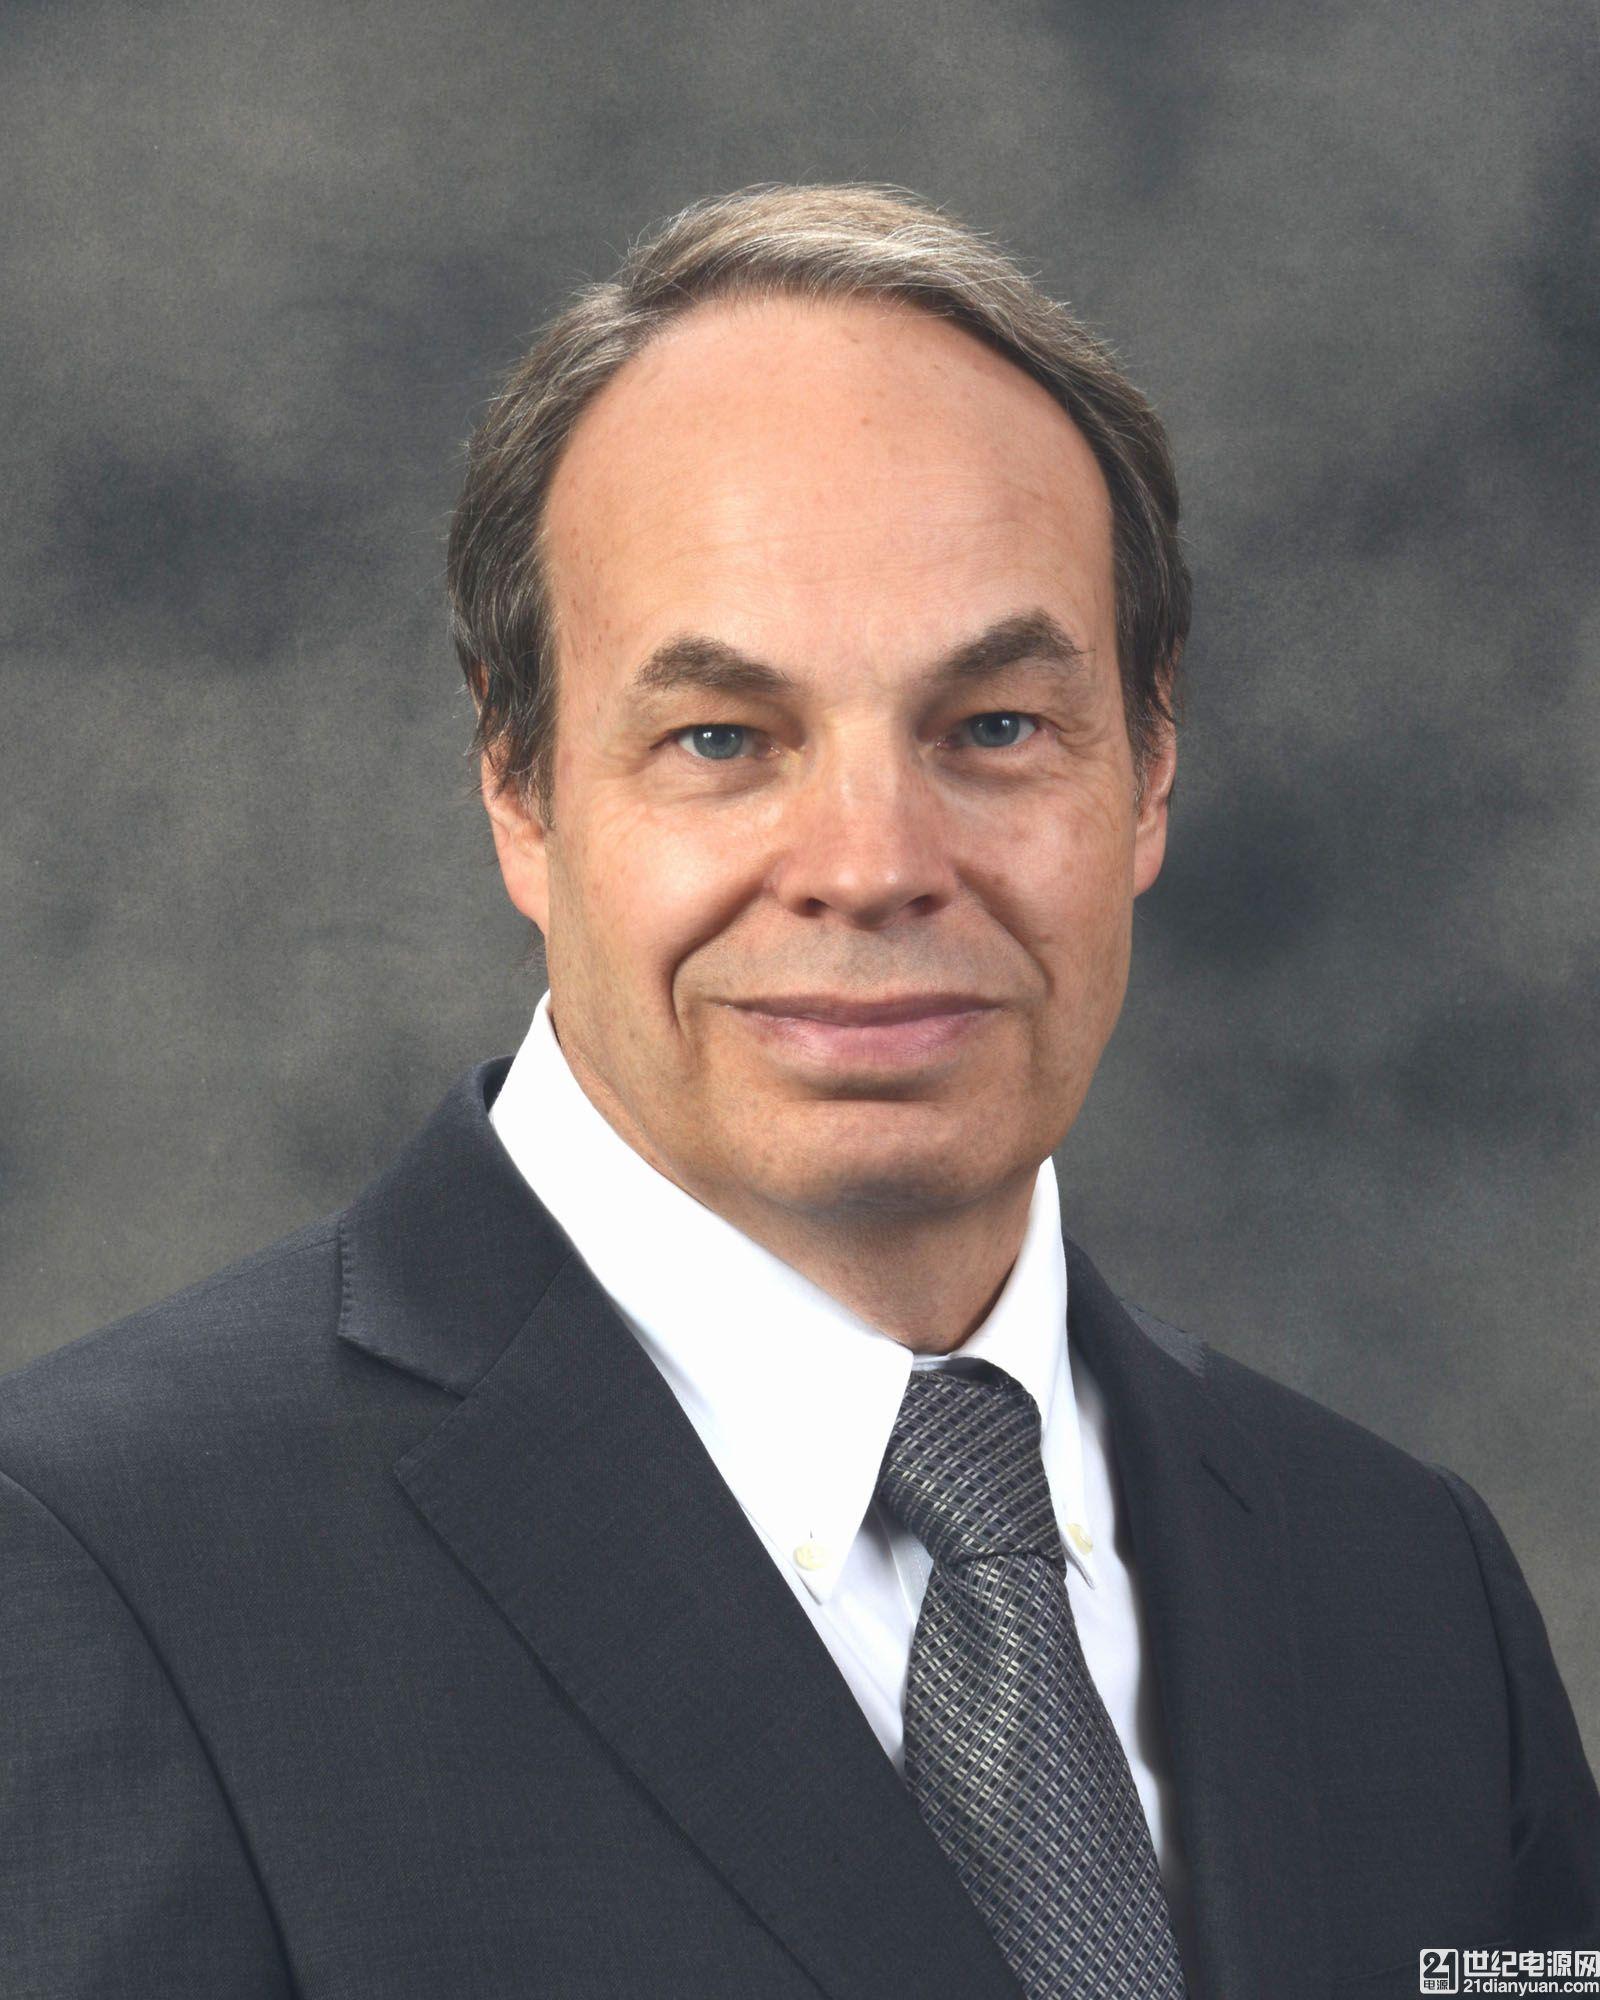 ADI 公司 Bob Adams 当选为美国国家工程院院士